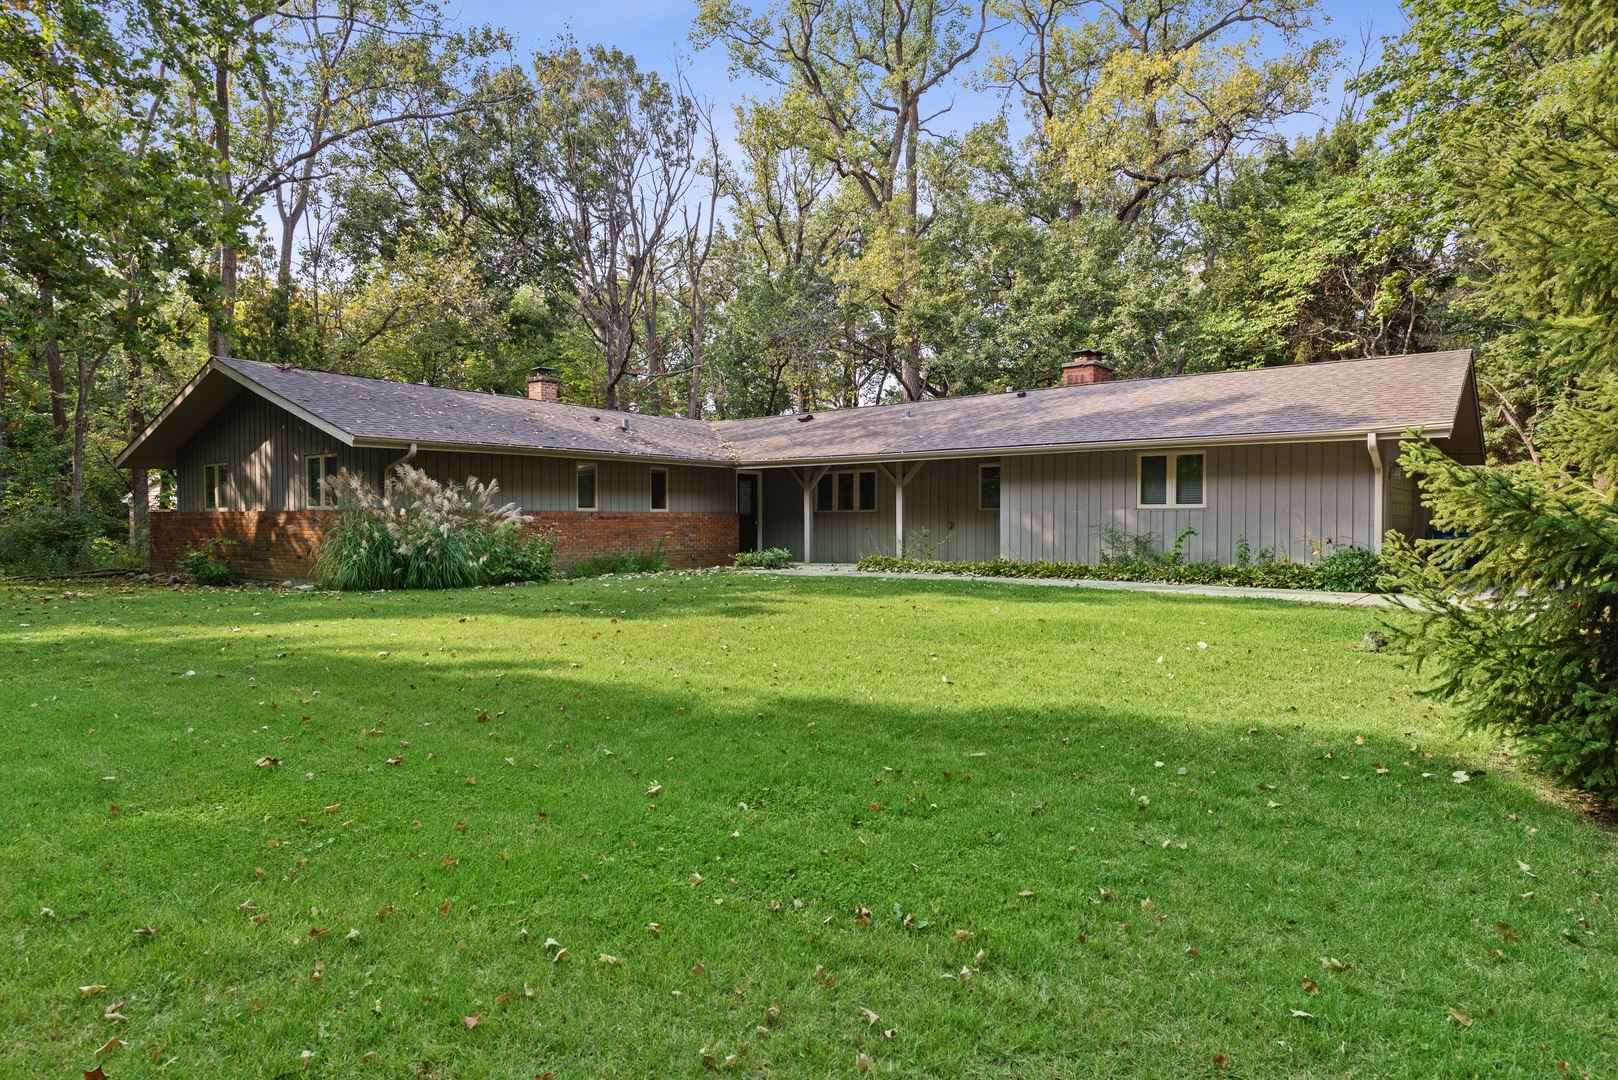 2800 Riverwoods Road, Riverwoods, IL 60015 - #: 11220387